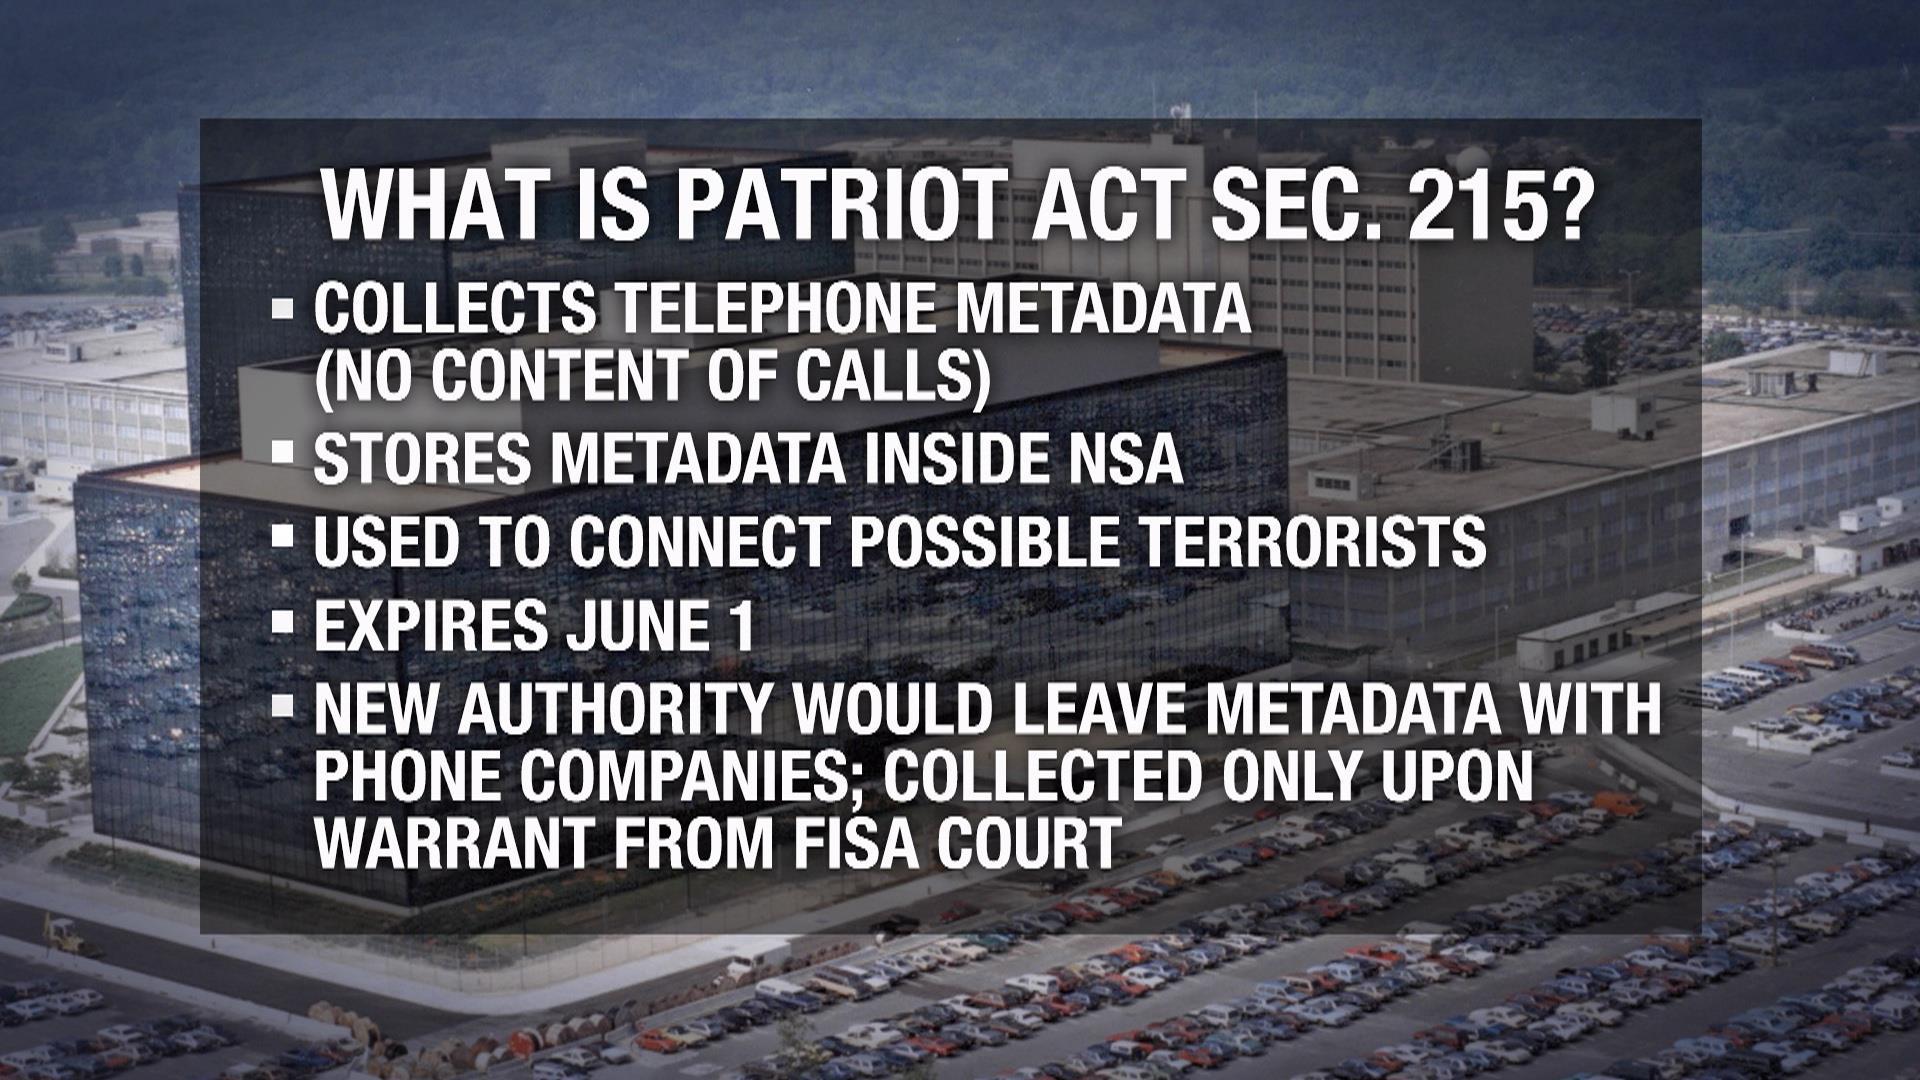 Patriot Act provisions to expire